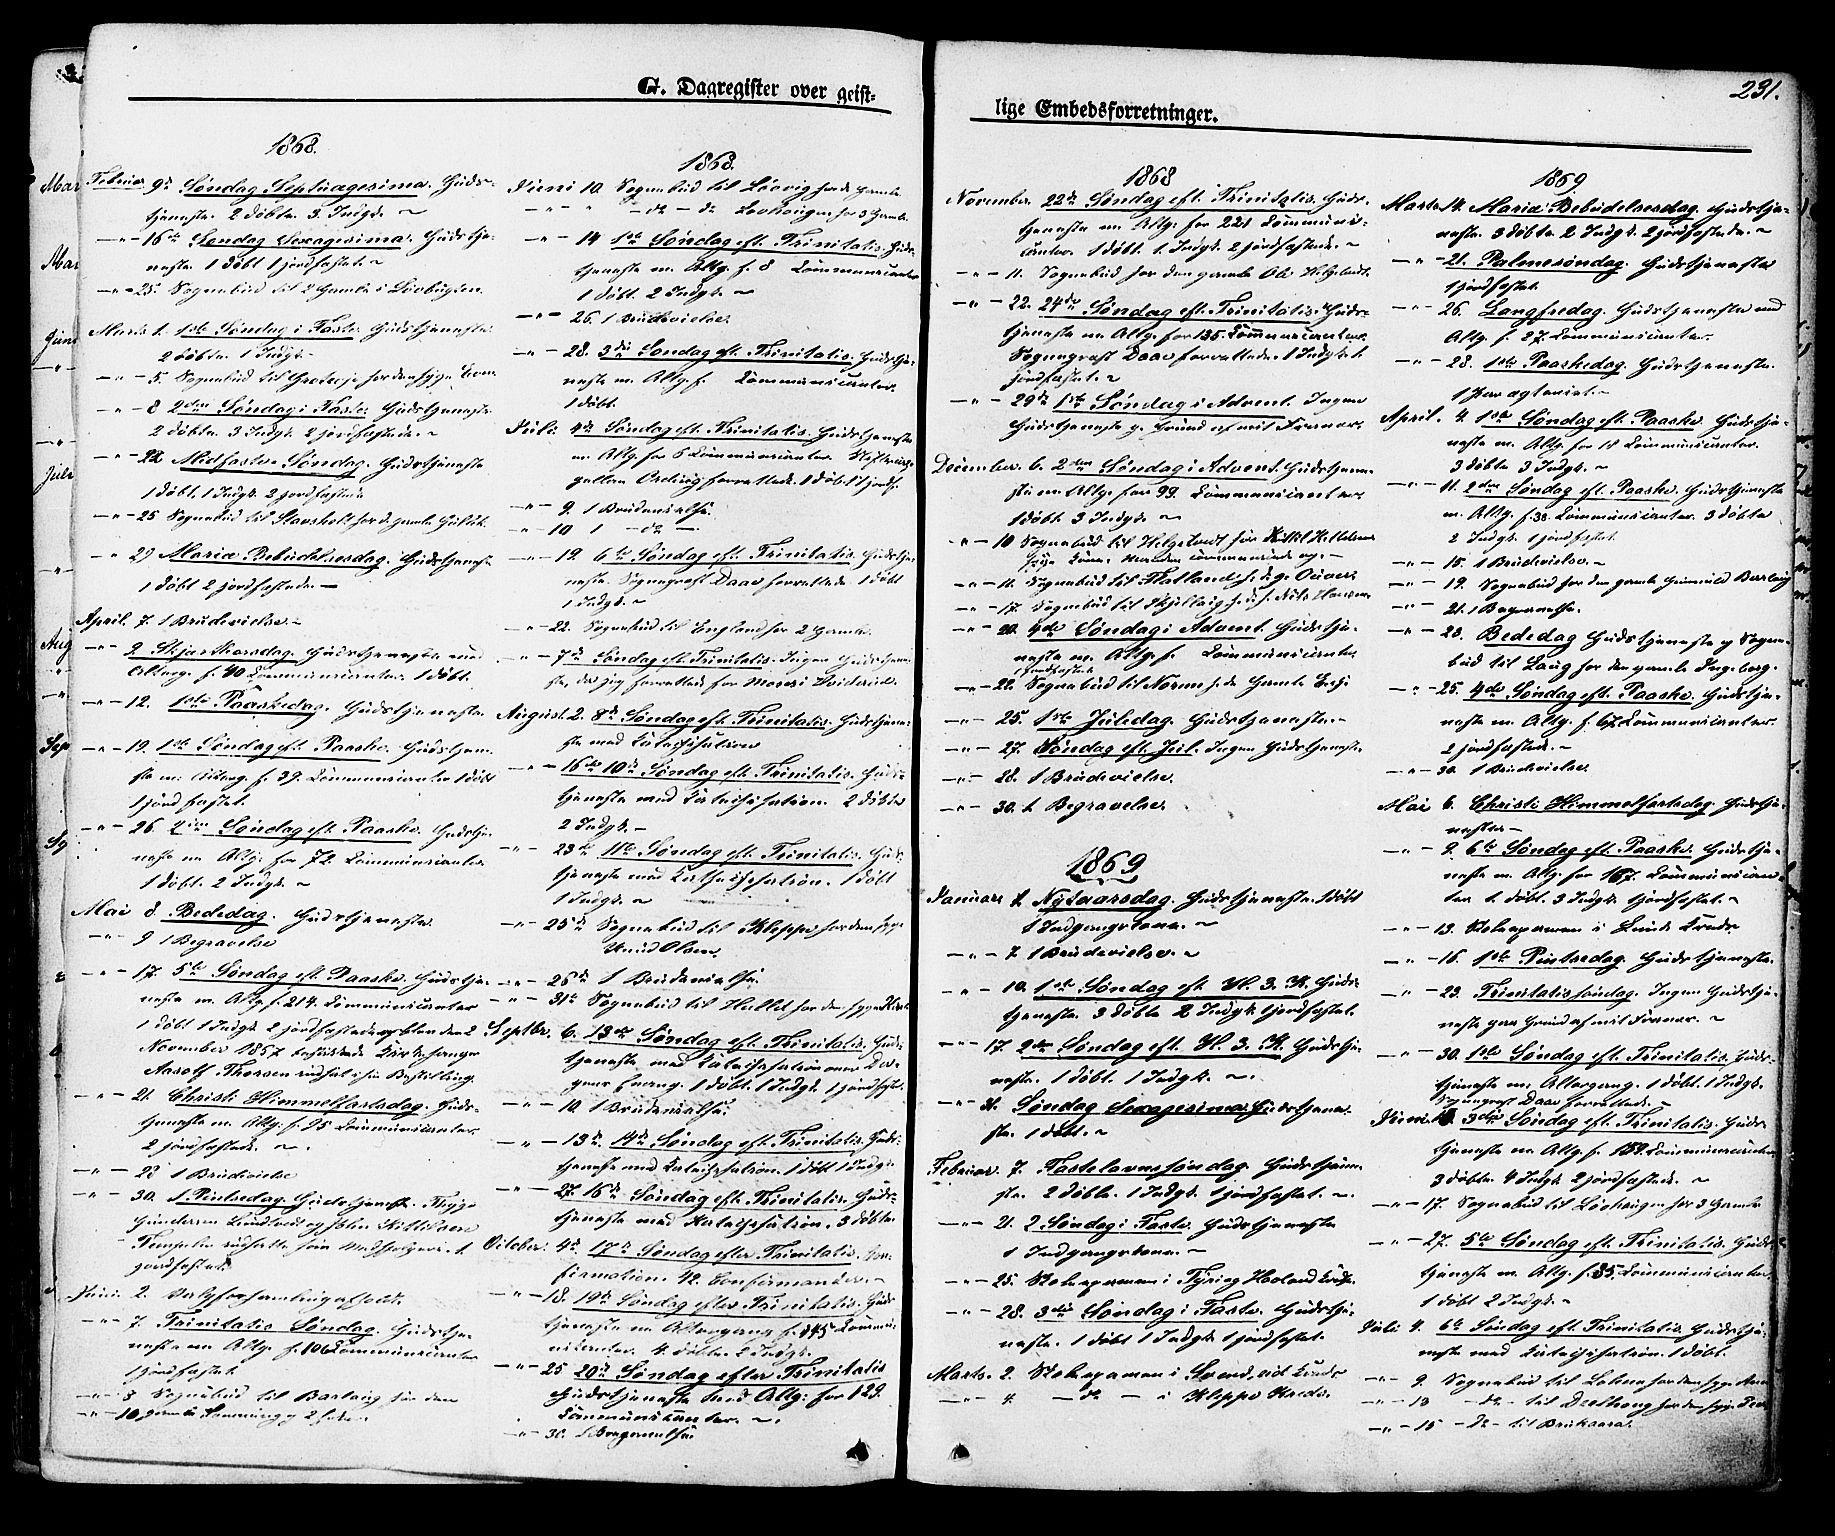 SAKO, Lunde kirkebøker, F/Fa/L0001: Ministerialbok nr. I 1, 1866-1883, s. 231